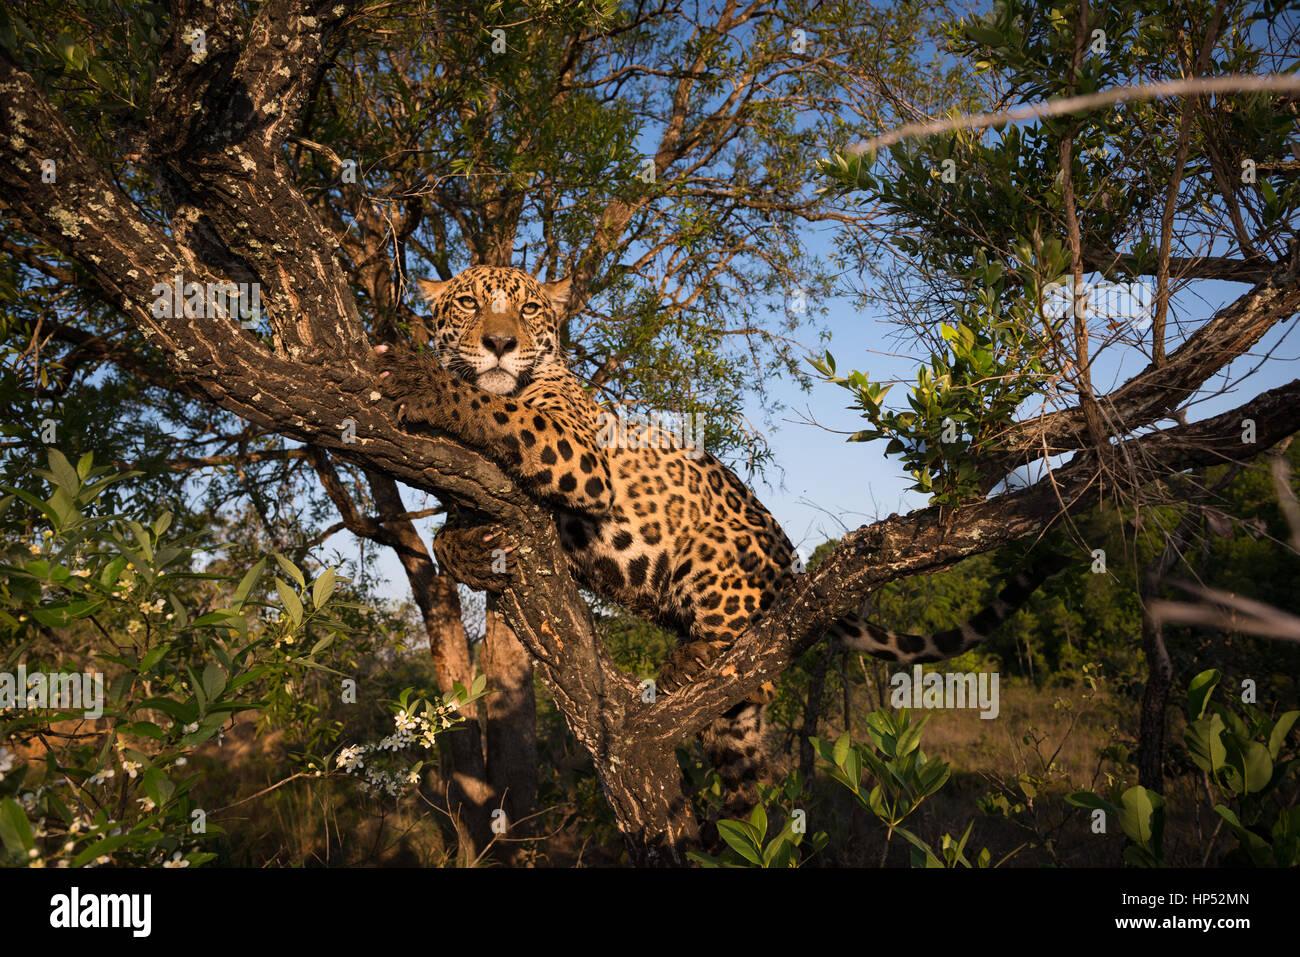 A Jaguar climbs a small tree on the Cerrado of Central Brazil Stock Photo